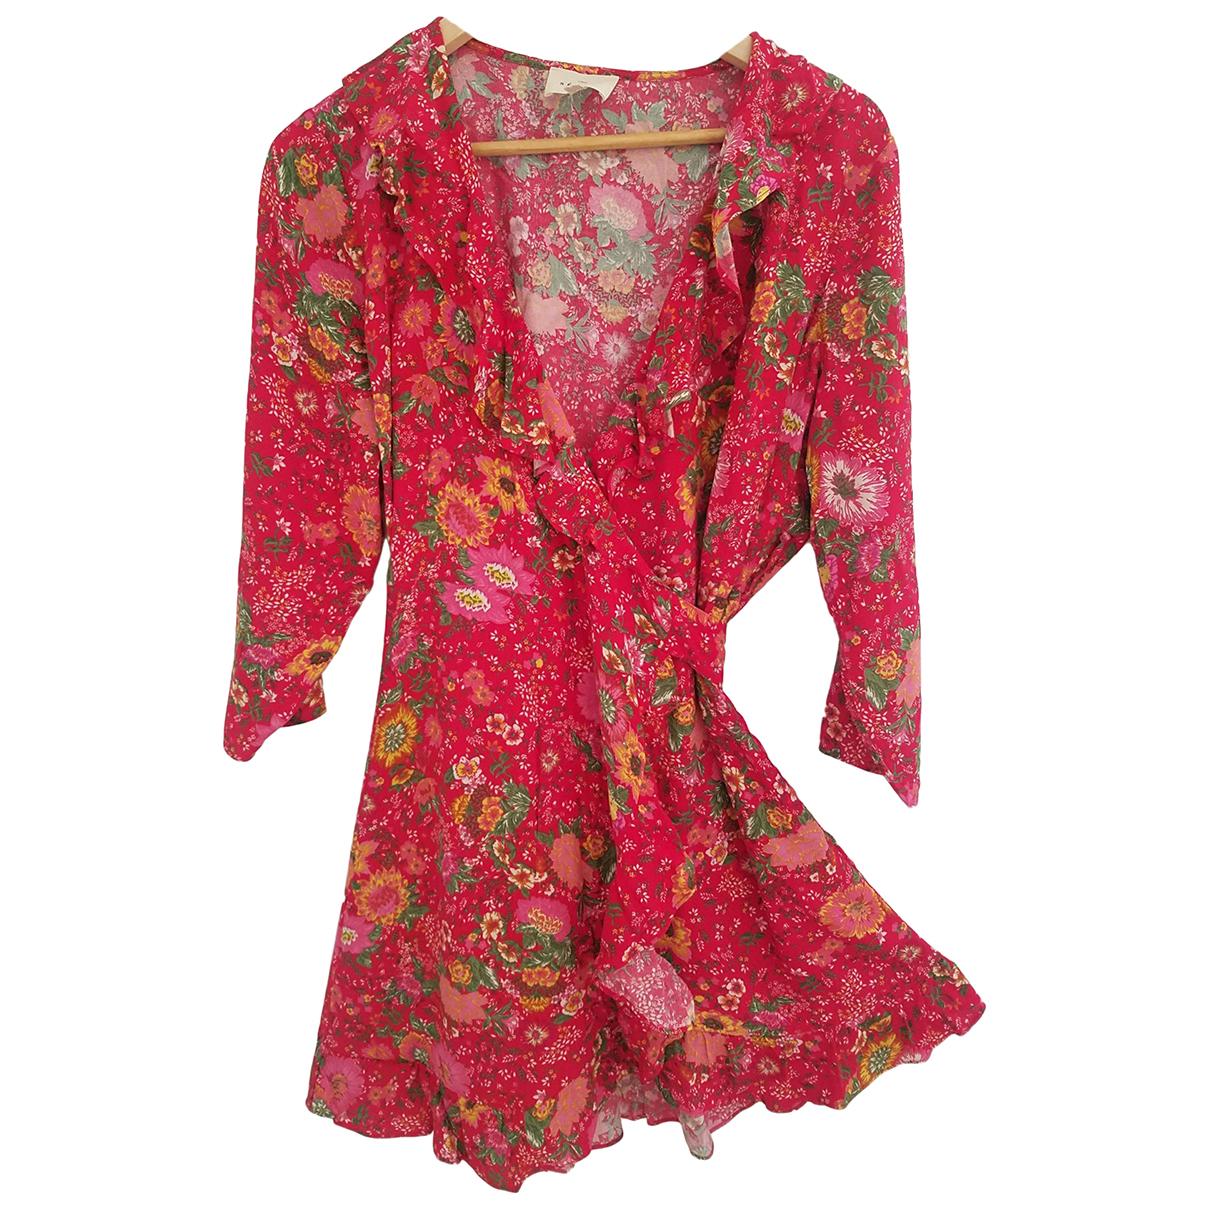 Sezane - Robe Spring Summer 2020 pour femme - rouge